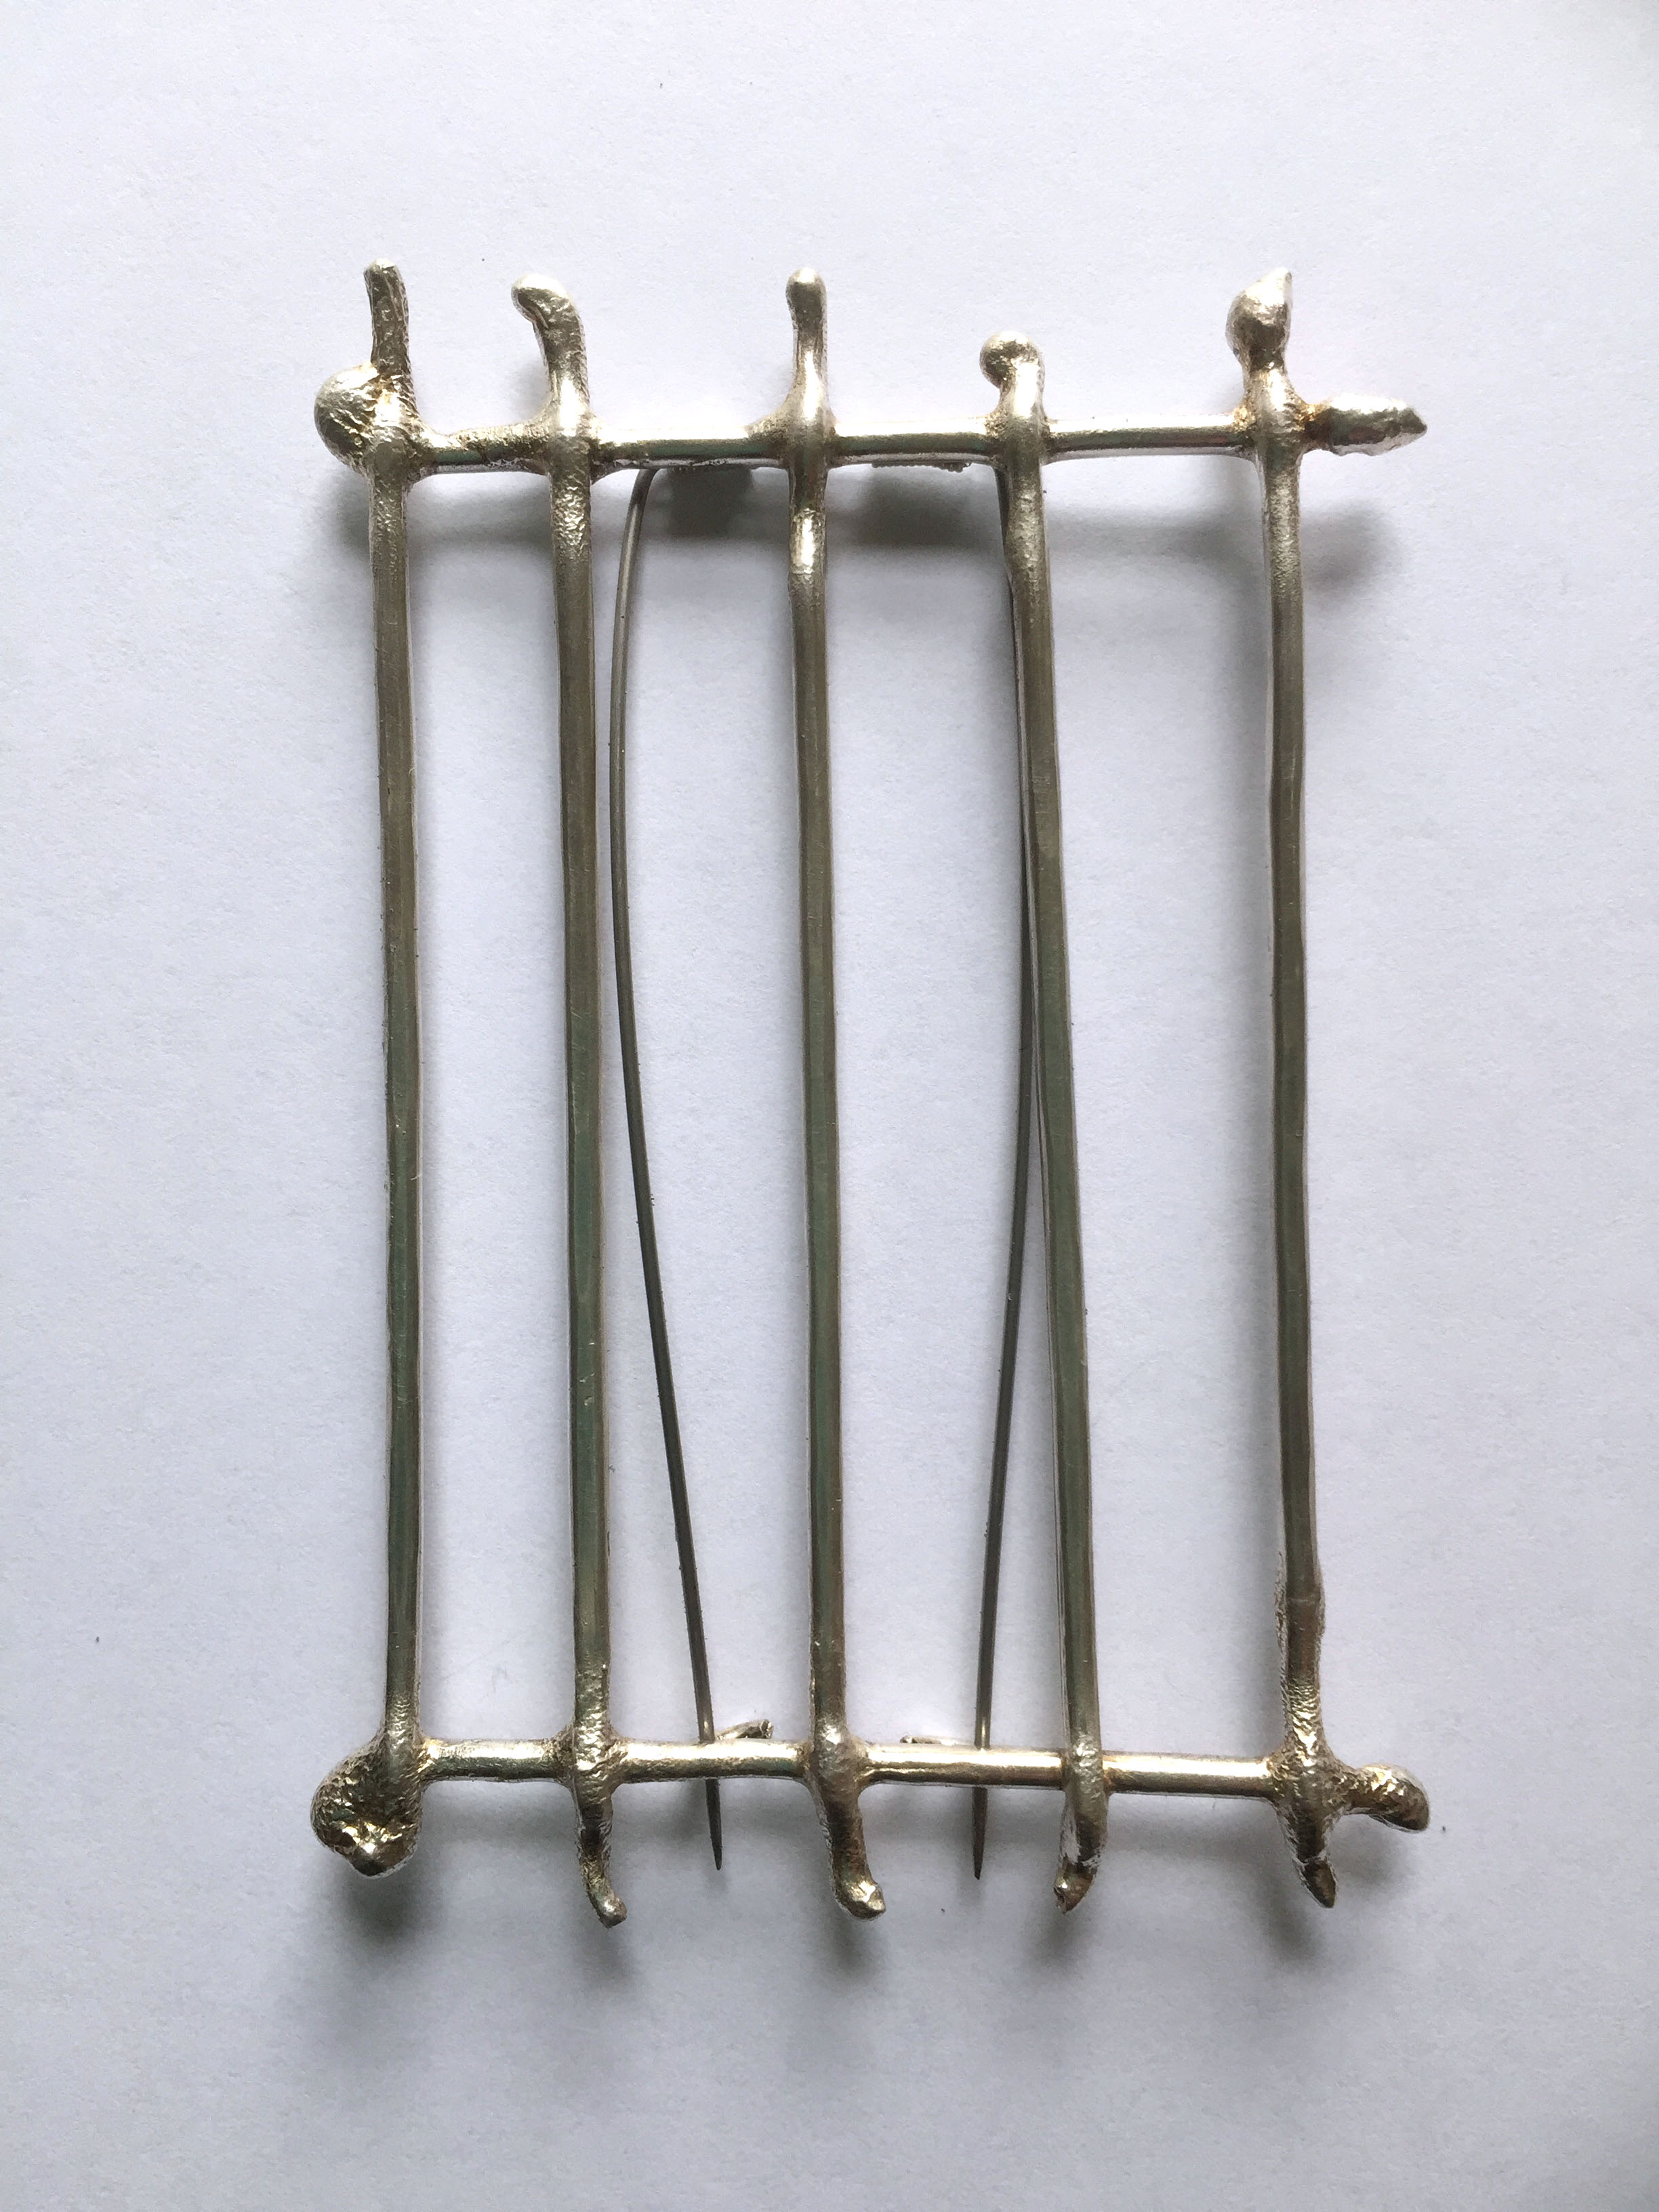 Fence Study #3, brooch, Sterling Silver, 2015, 8 x 5 x 1 cm, 200.00 CAD